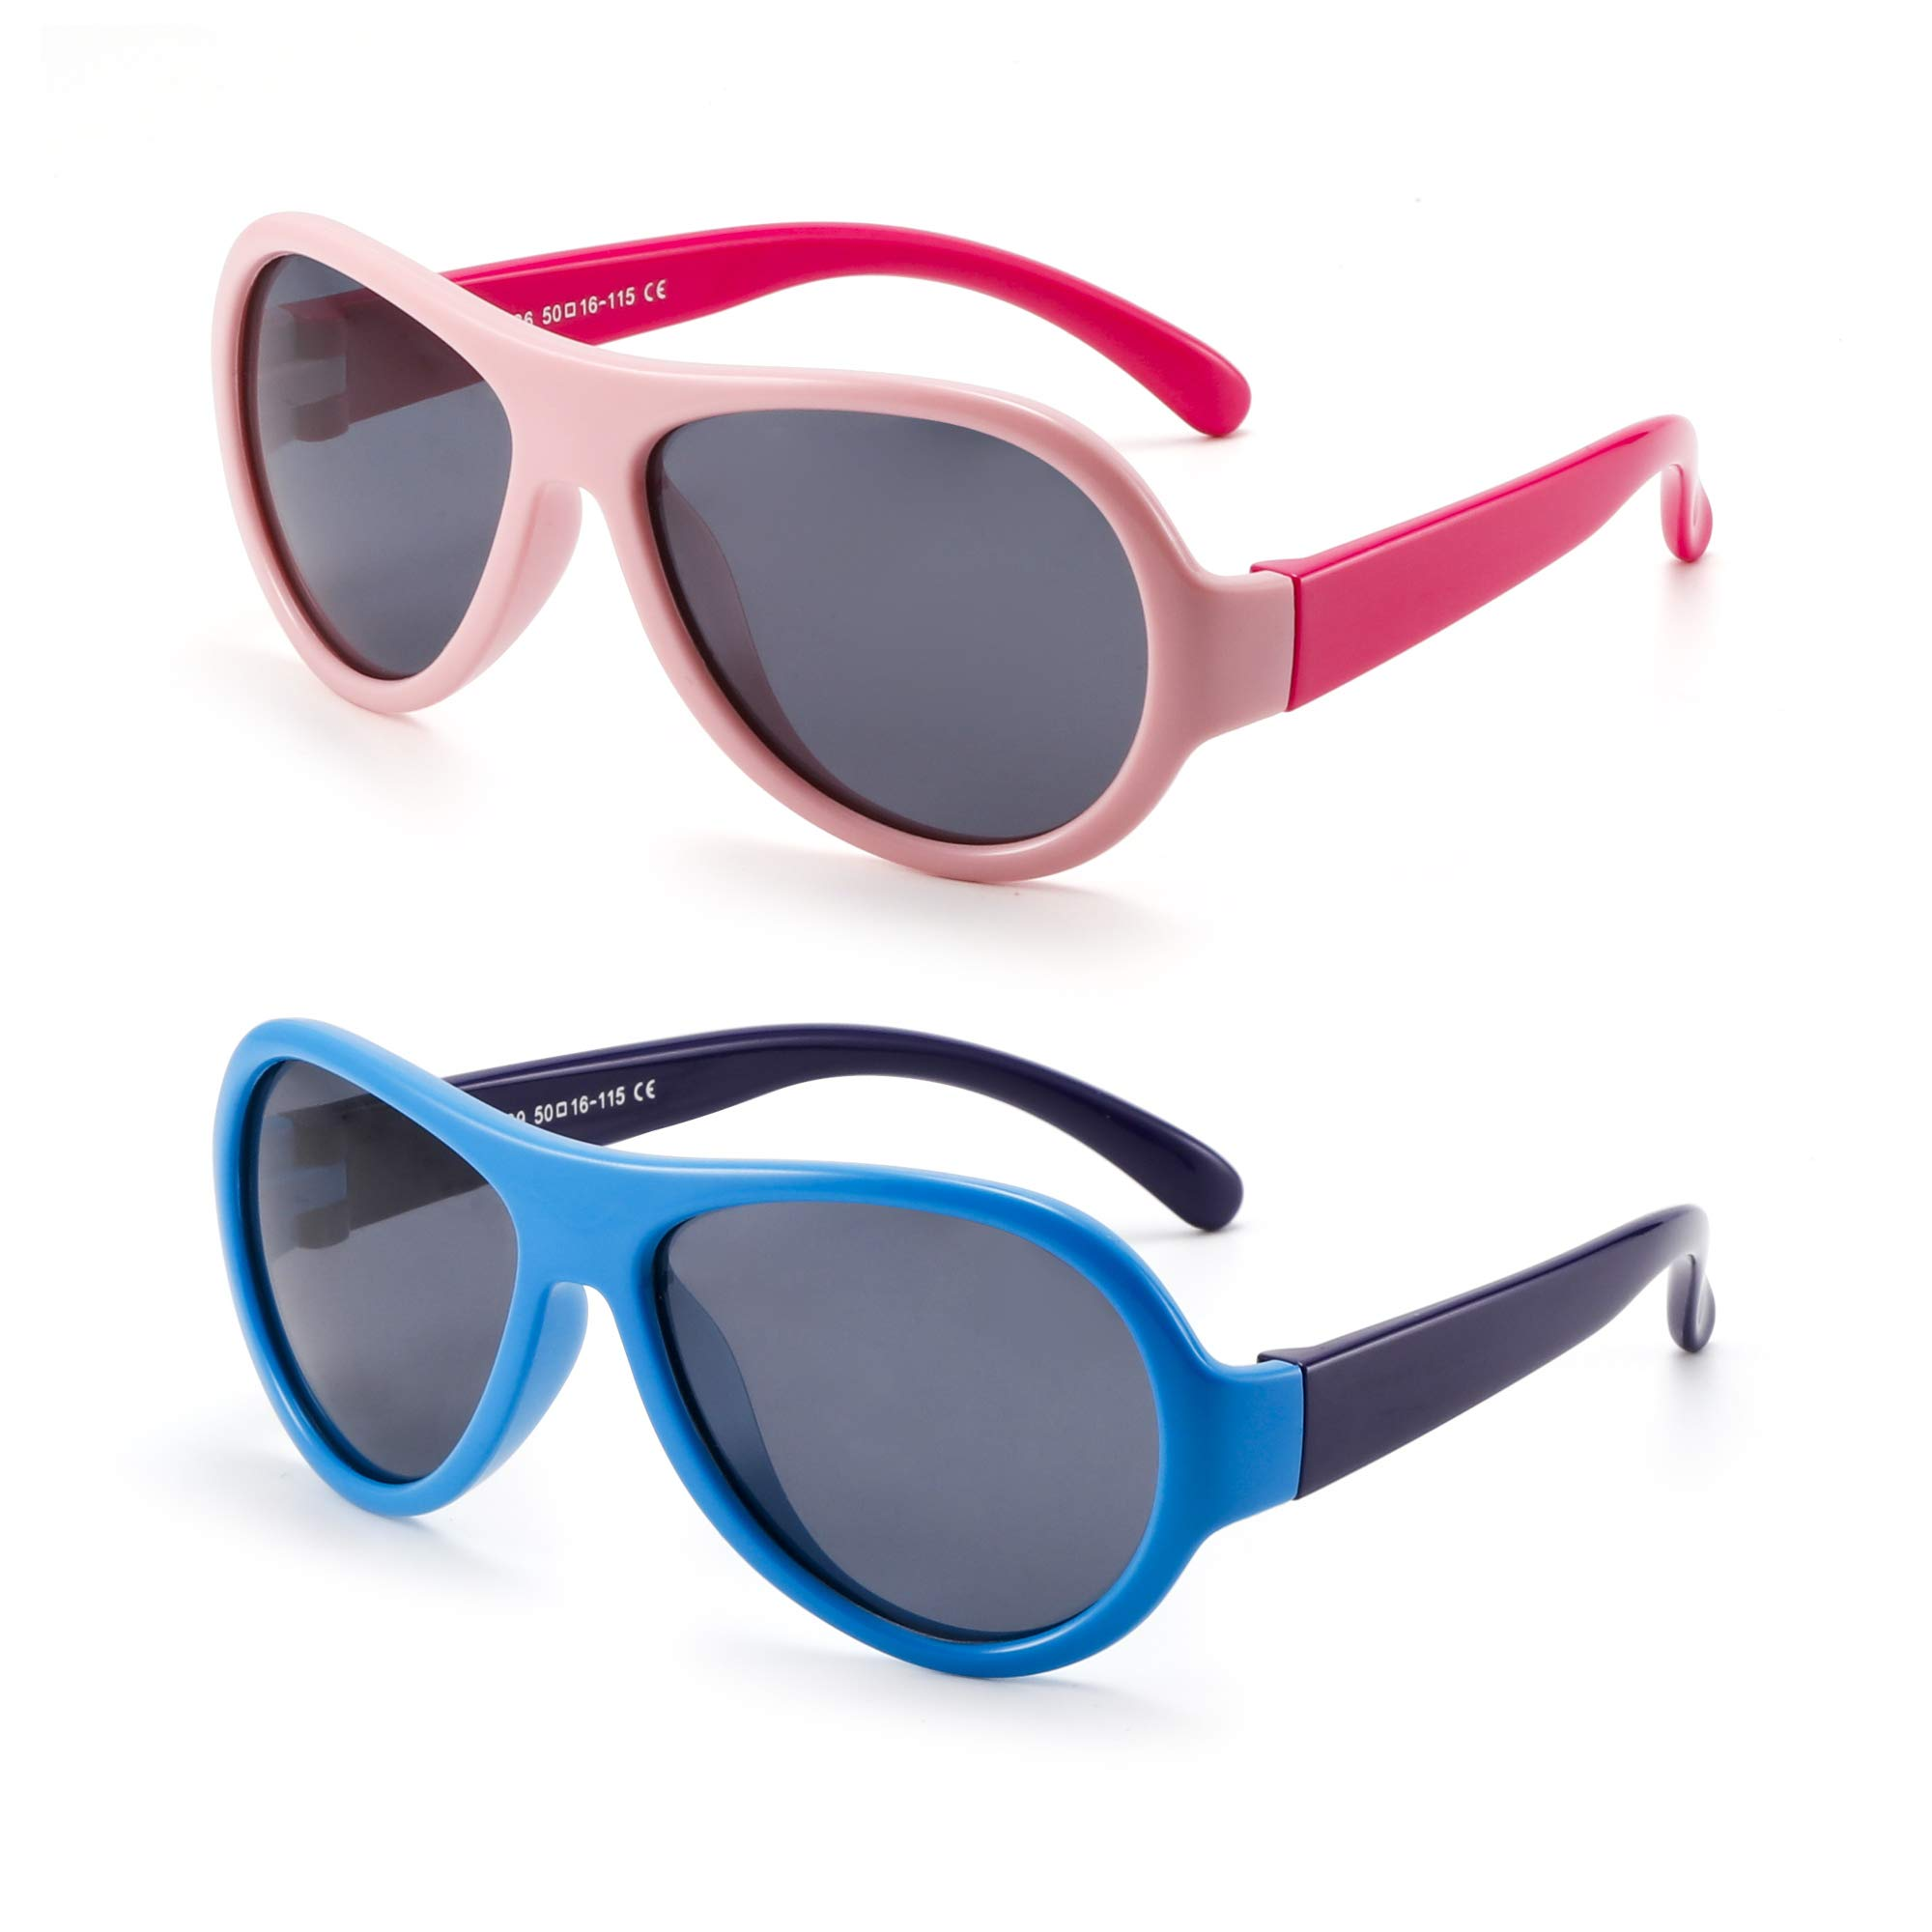 Kids Rubber Polarized Sunglasses Unbreakable Children Girls Boys Age 3-12 2 Pack (Pink & Blue)